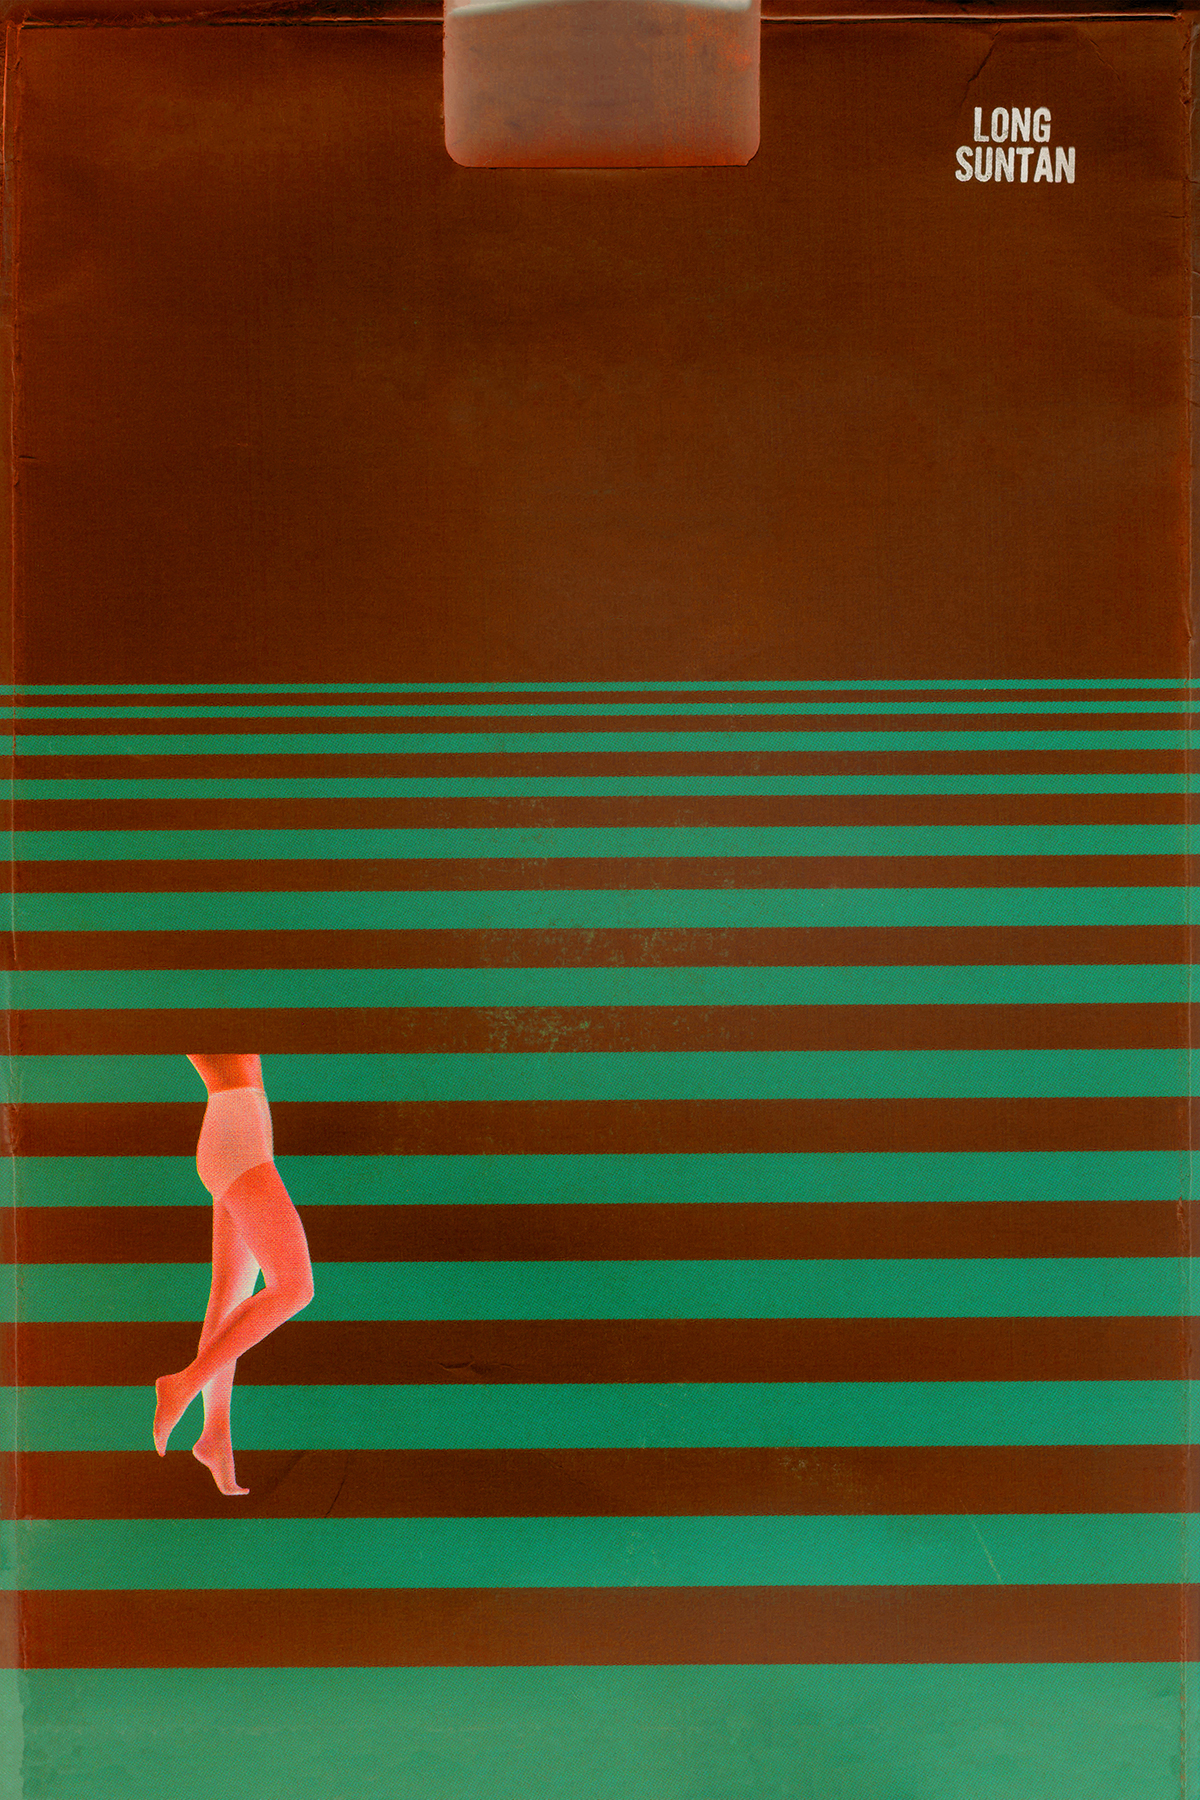 Julie Sando, Long Suntan (Nightshade), 2020